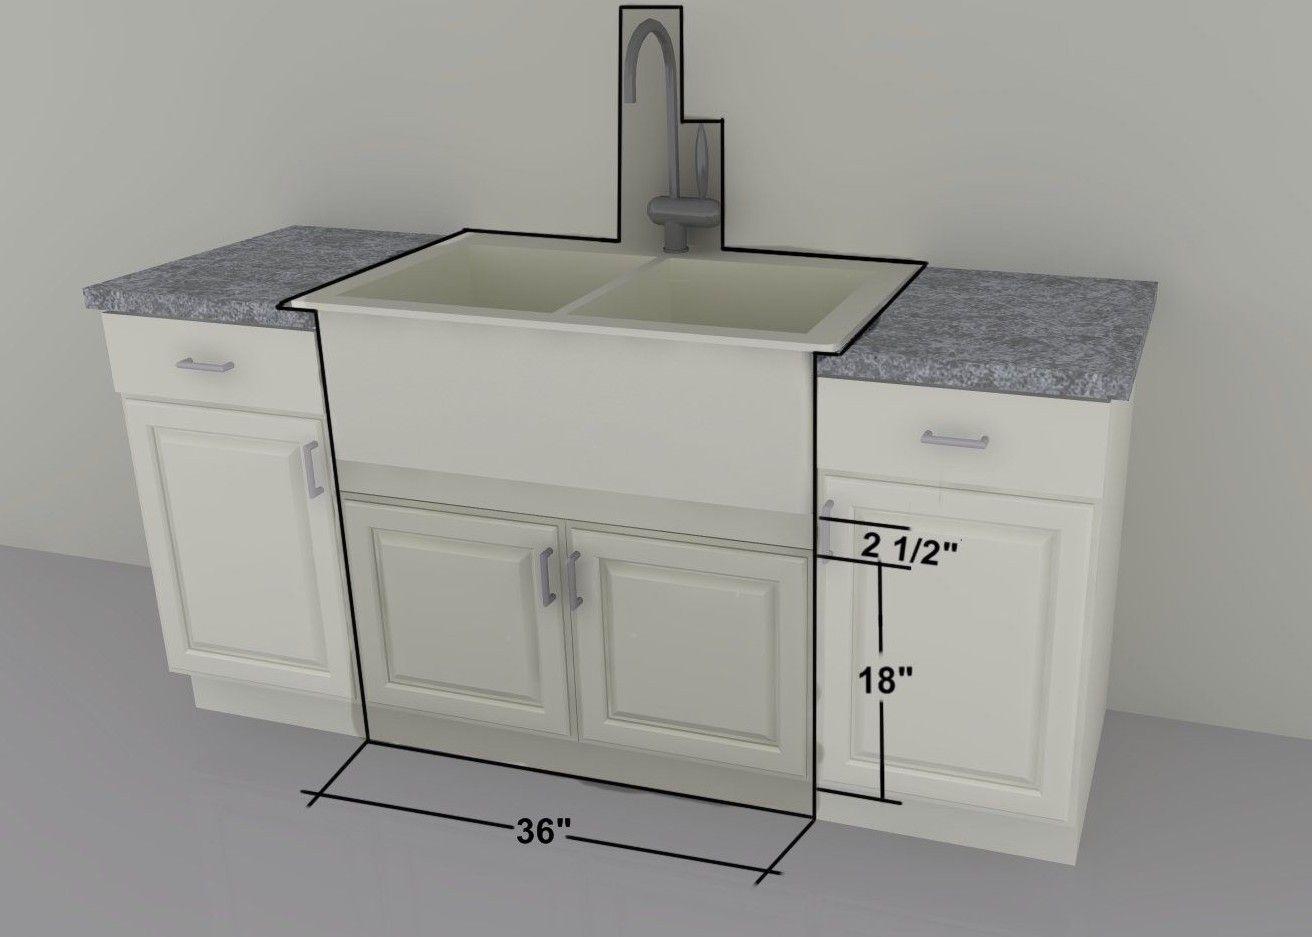 Ikea Kitchen Hack A Base Cabinet For Farmhouse Sinks And Deep Cooktops Ikea Sinks Ikea Farmhouse Sink Ikea Farm Sink